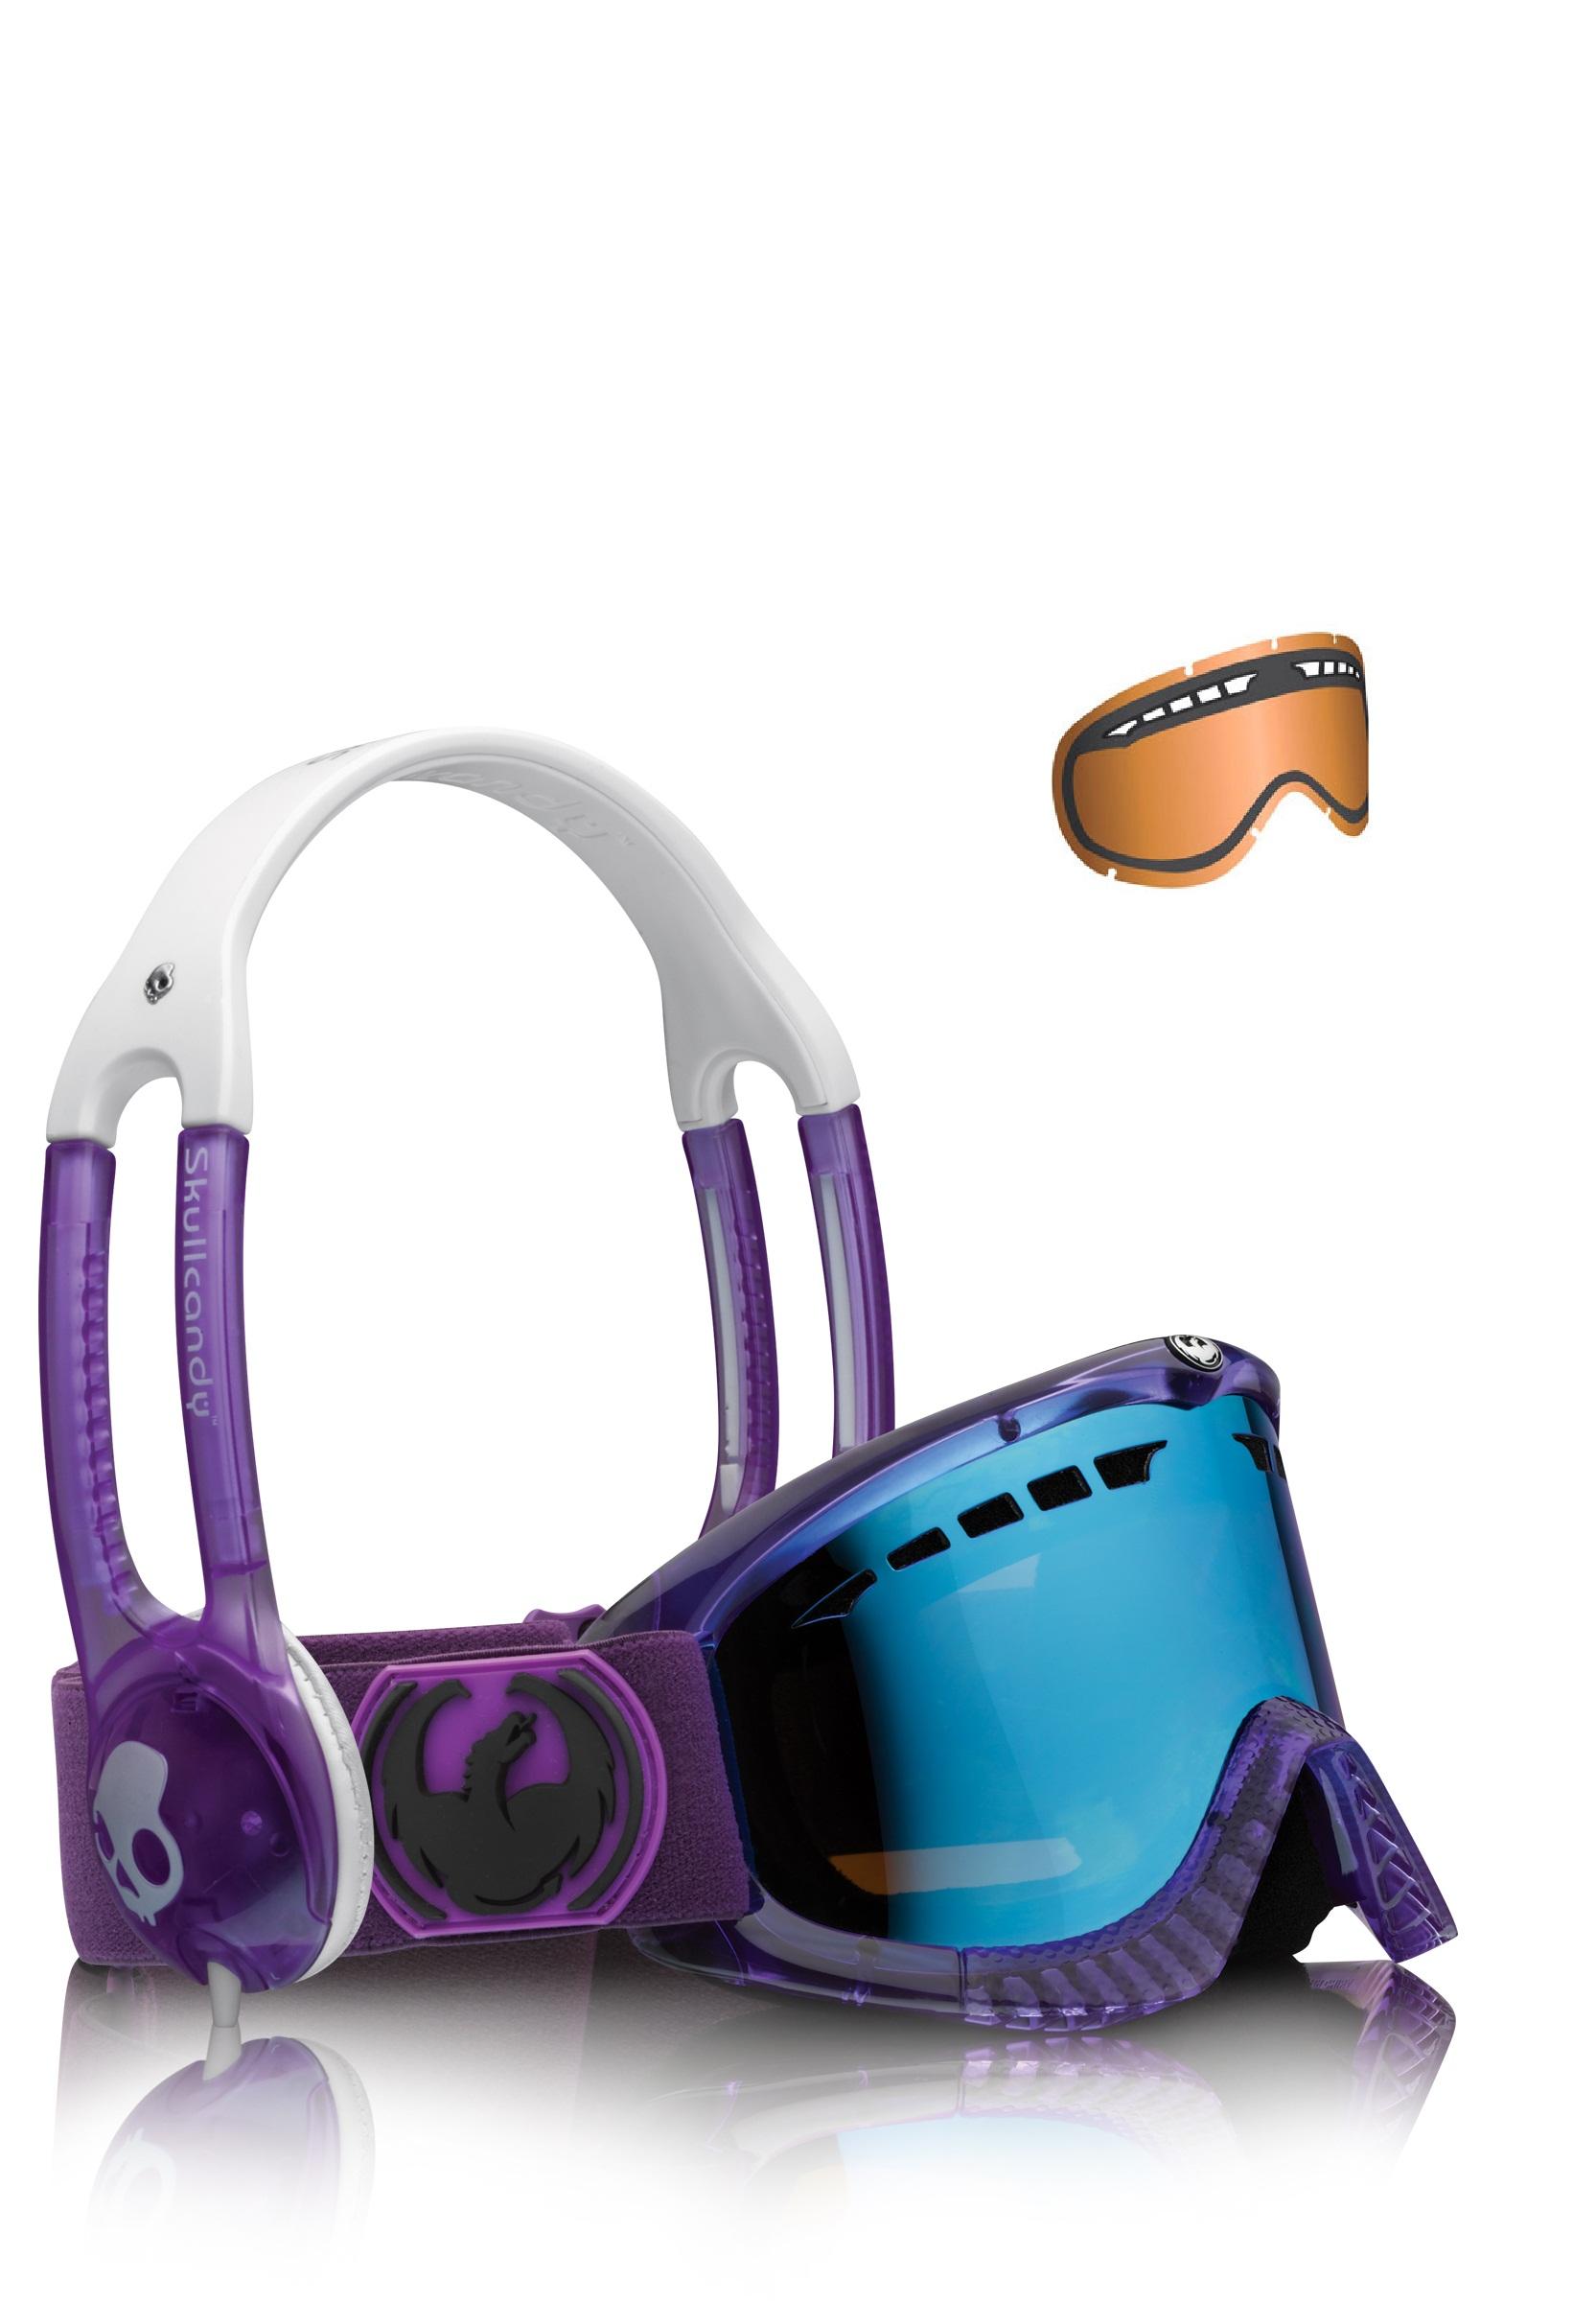 buy goggles online  dxs goggles